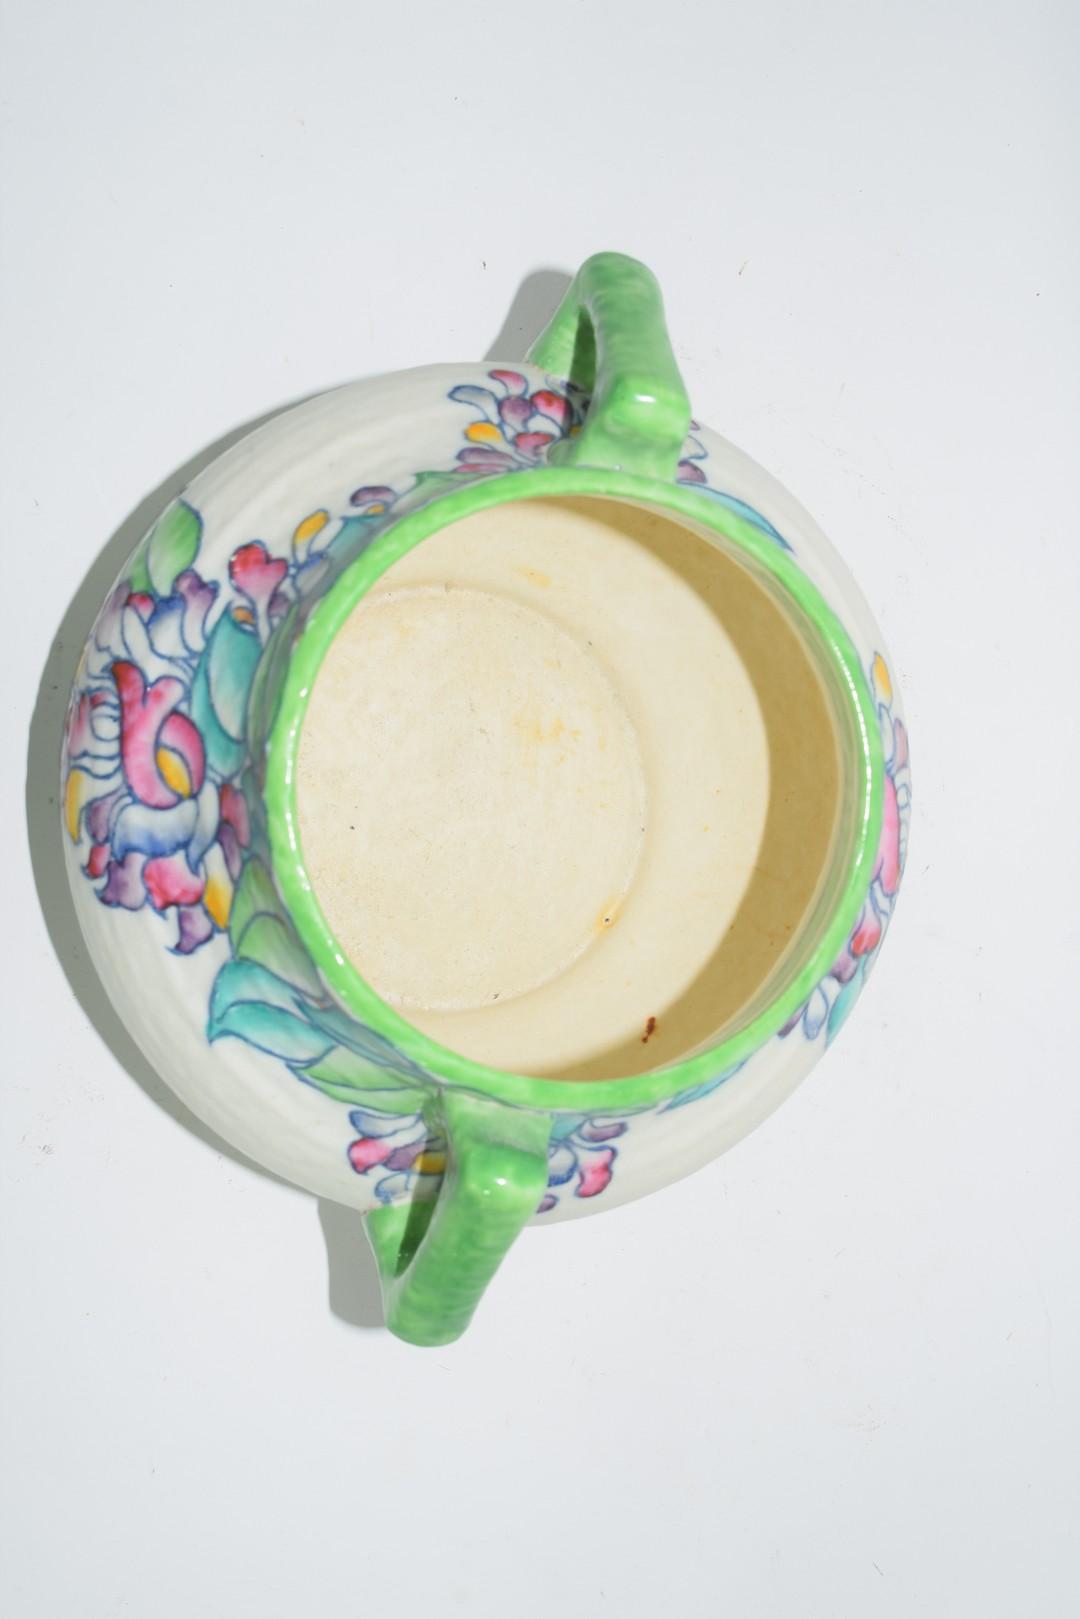 Charlotte Rhead vase pattern no 4954 - Image 5 of 6